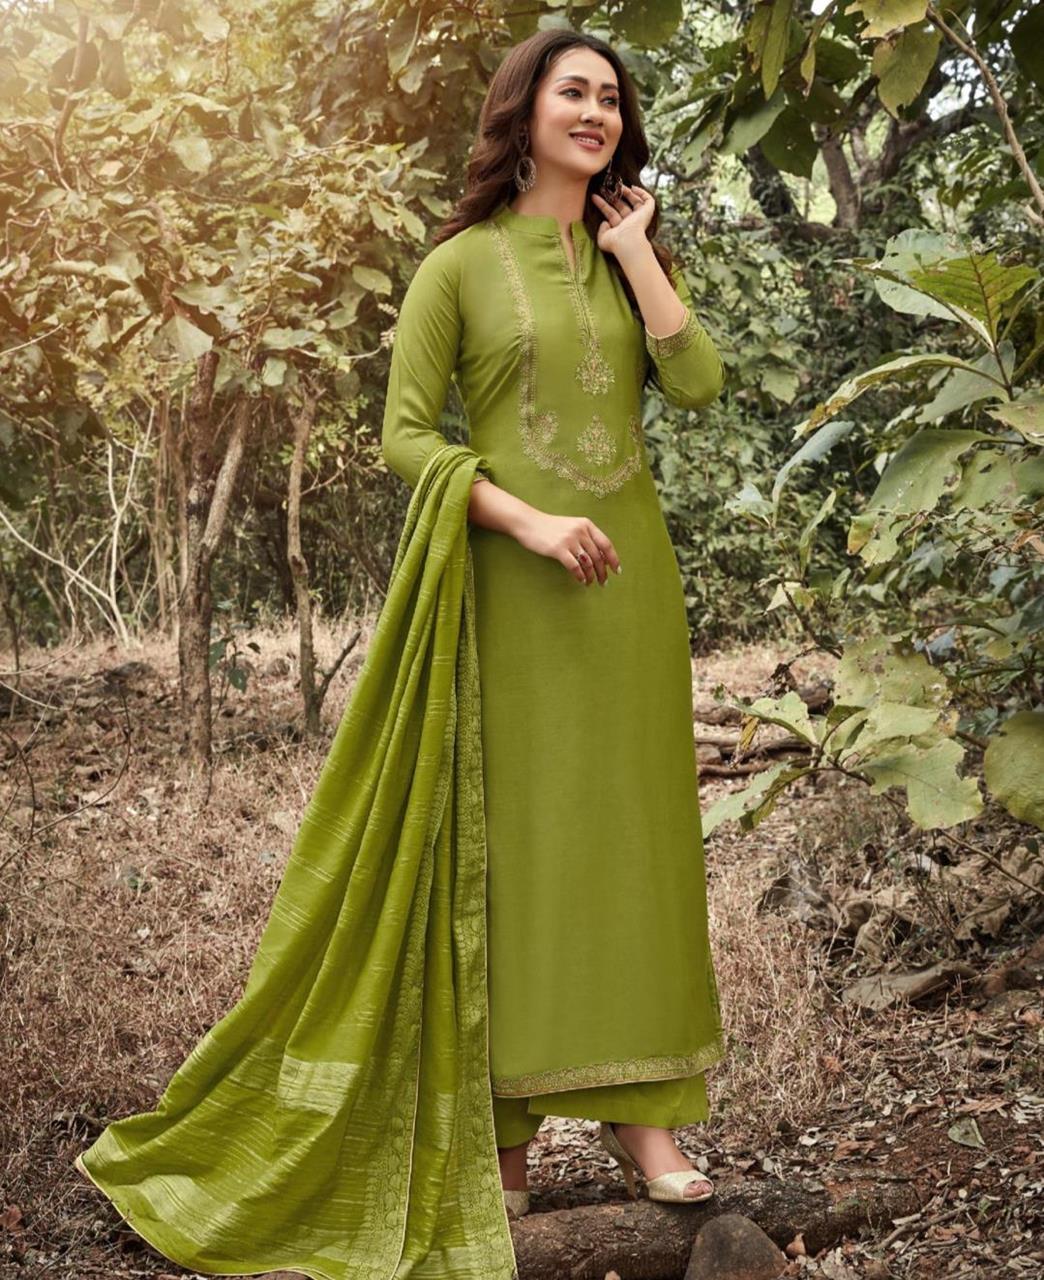 Zari Cotton Straight cut Salwar Kameez in Green